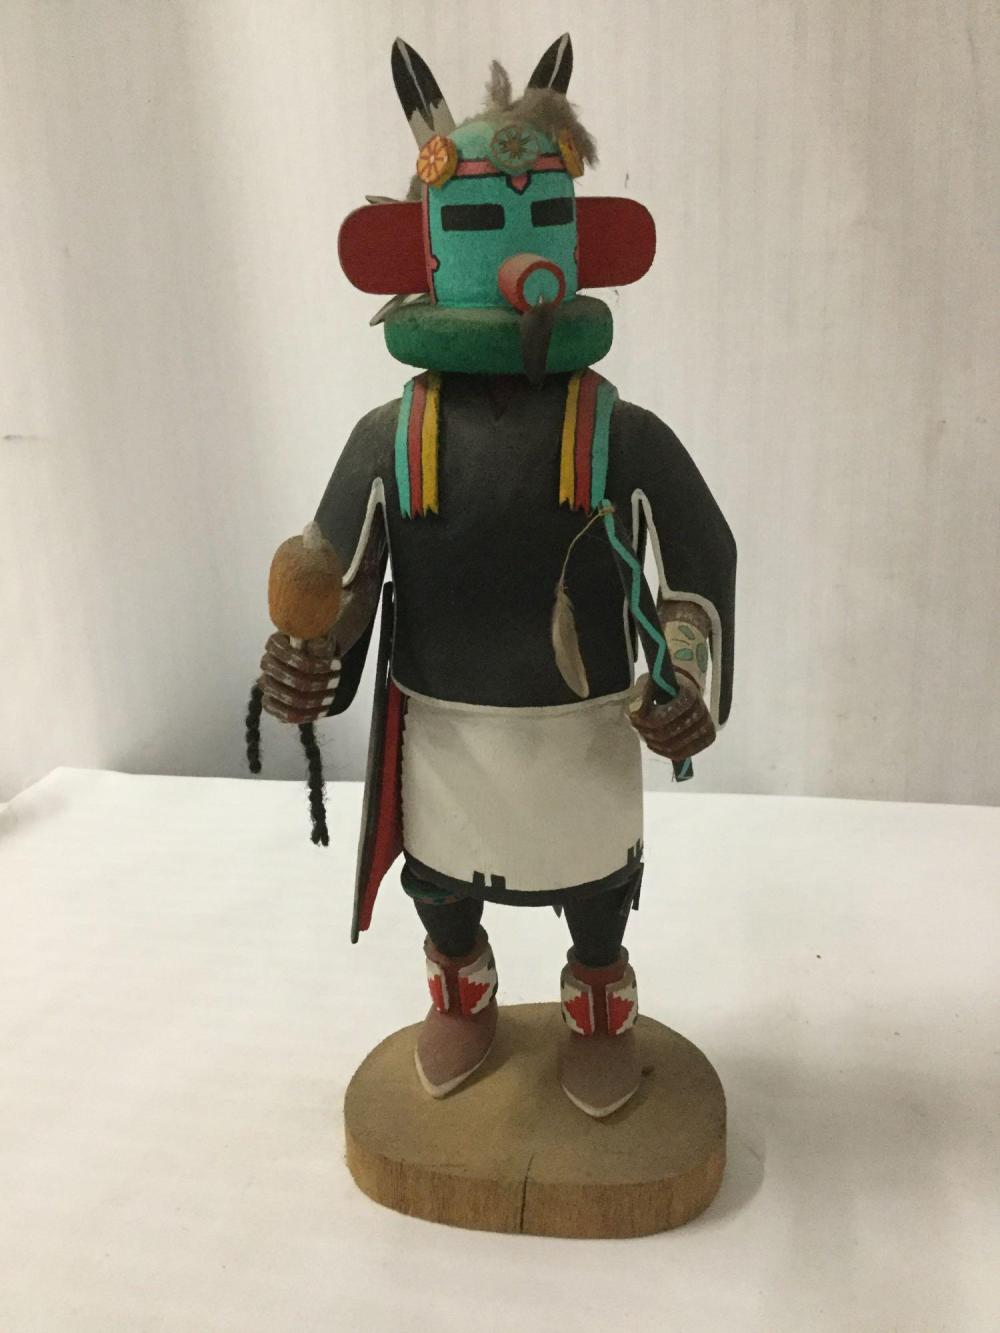 Lot 116: Native American art sculpture - Hopi Velvet Shirt kachina doll signed by artist S. Nez